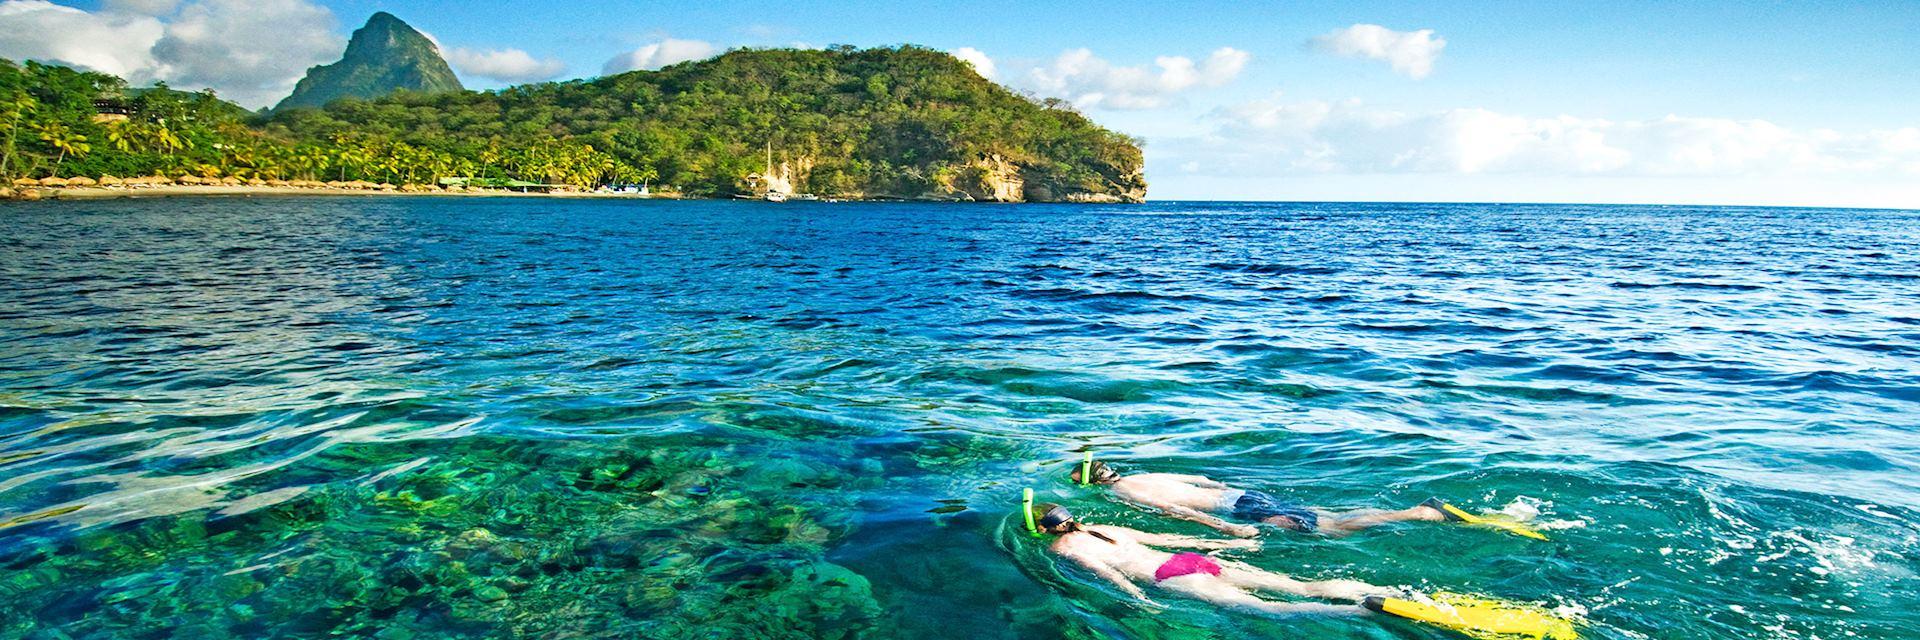 Snorkelling, Saint Lucia